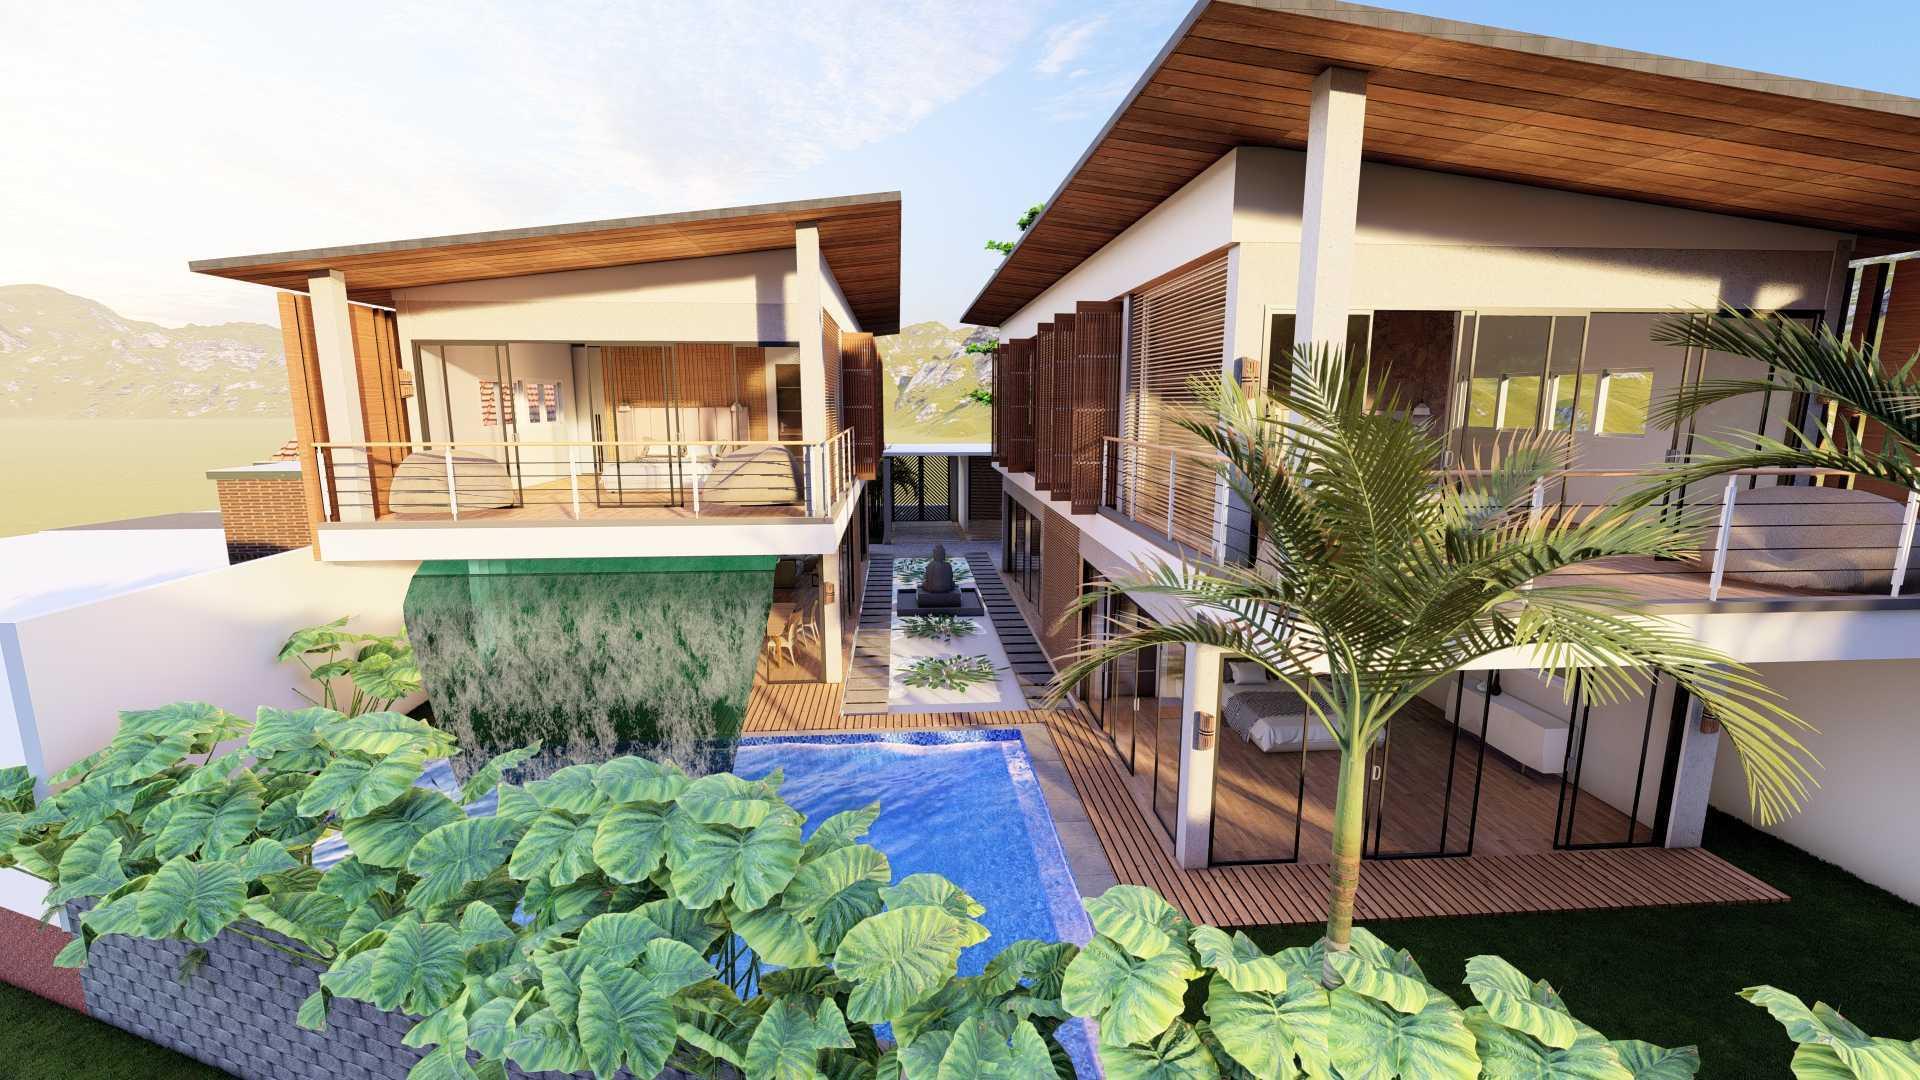 Habib Musa Arsitek Epd Lux Tropical Unit Tabanan, Kec. Tabanan, Kabupaten Tabanan, Bali, Indonesia Tabanan, Kec. Tabanan, Kabupaten Tabanan, Bali, Indonesia Habib-Musa-Architect-And-Associates-Epd-Lux-Tropical-Unit   103231